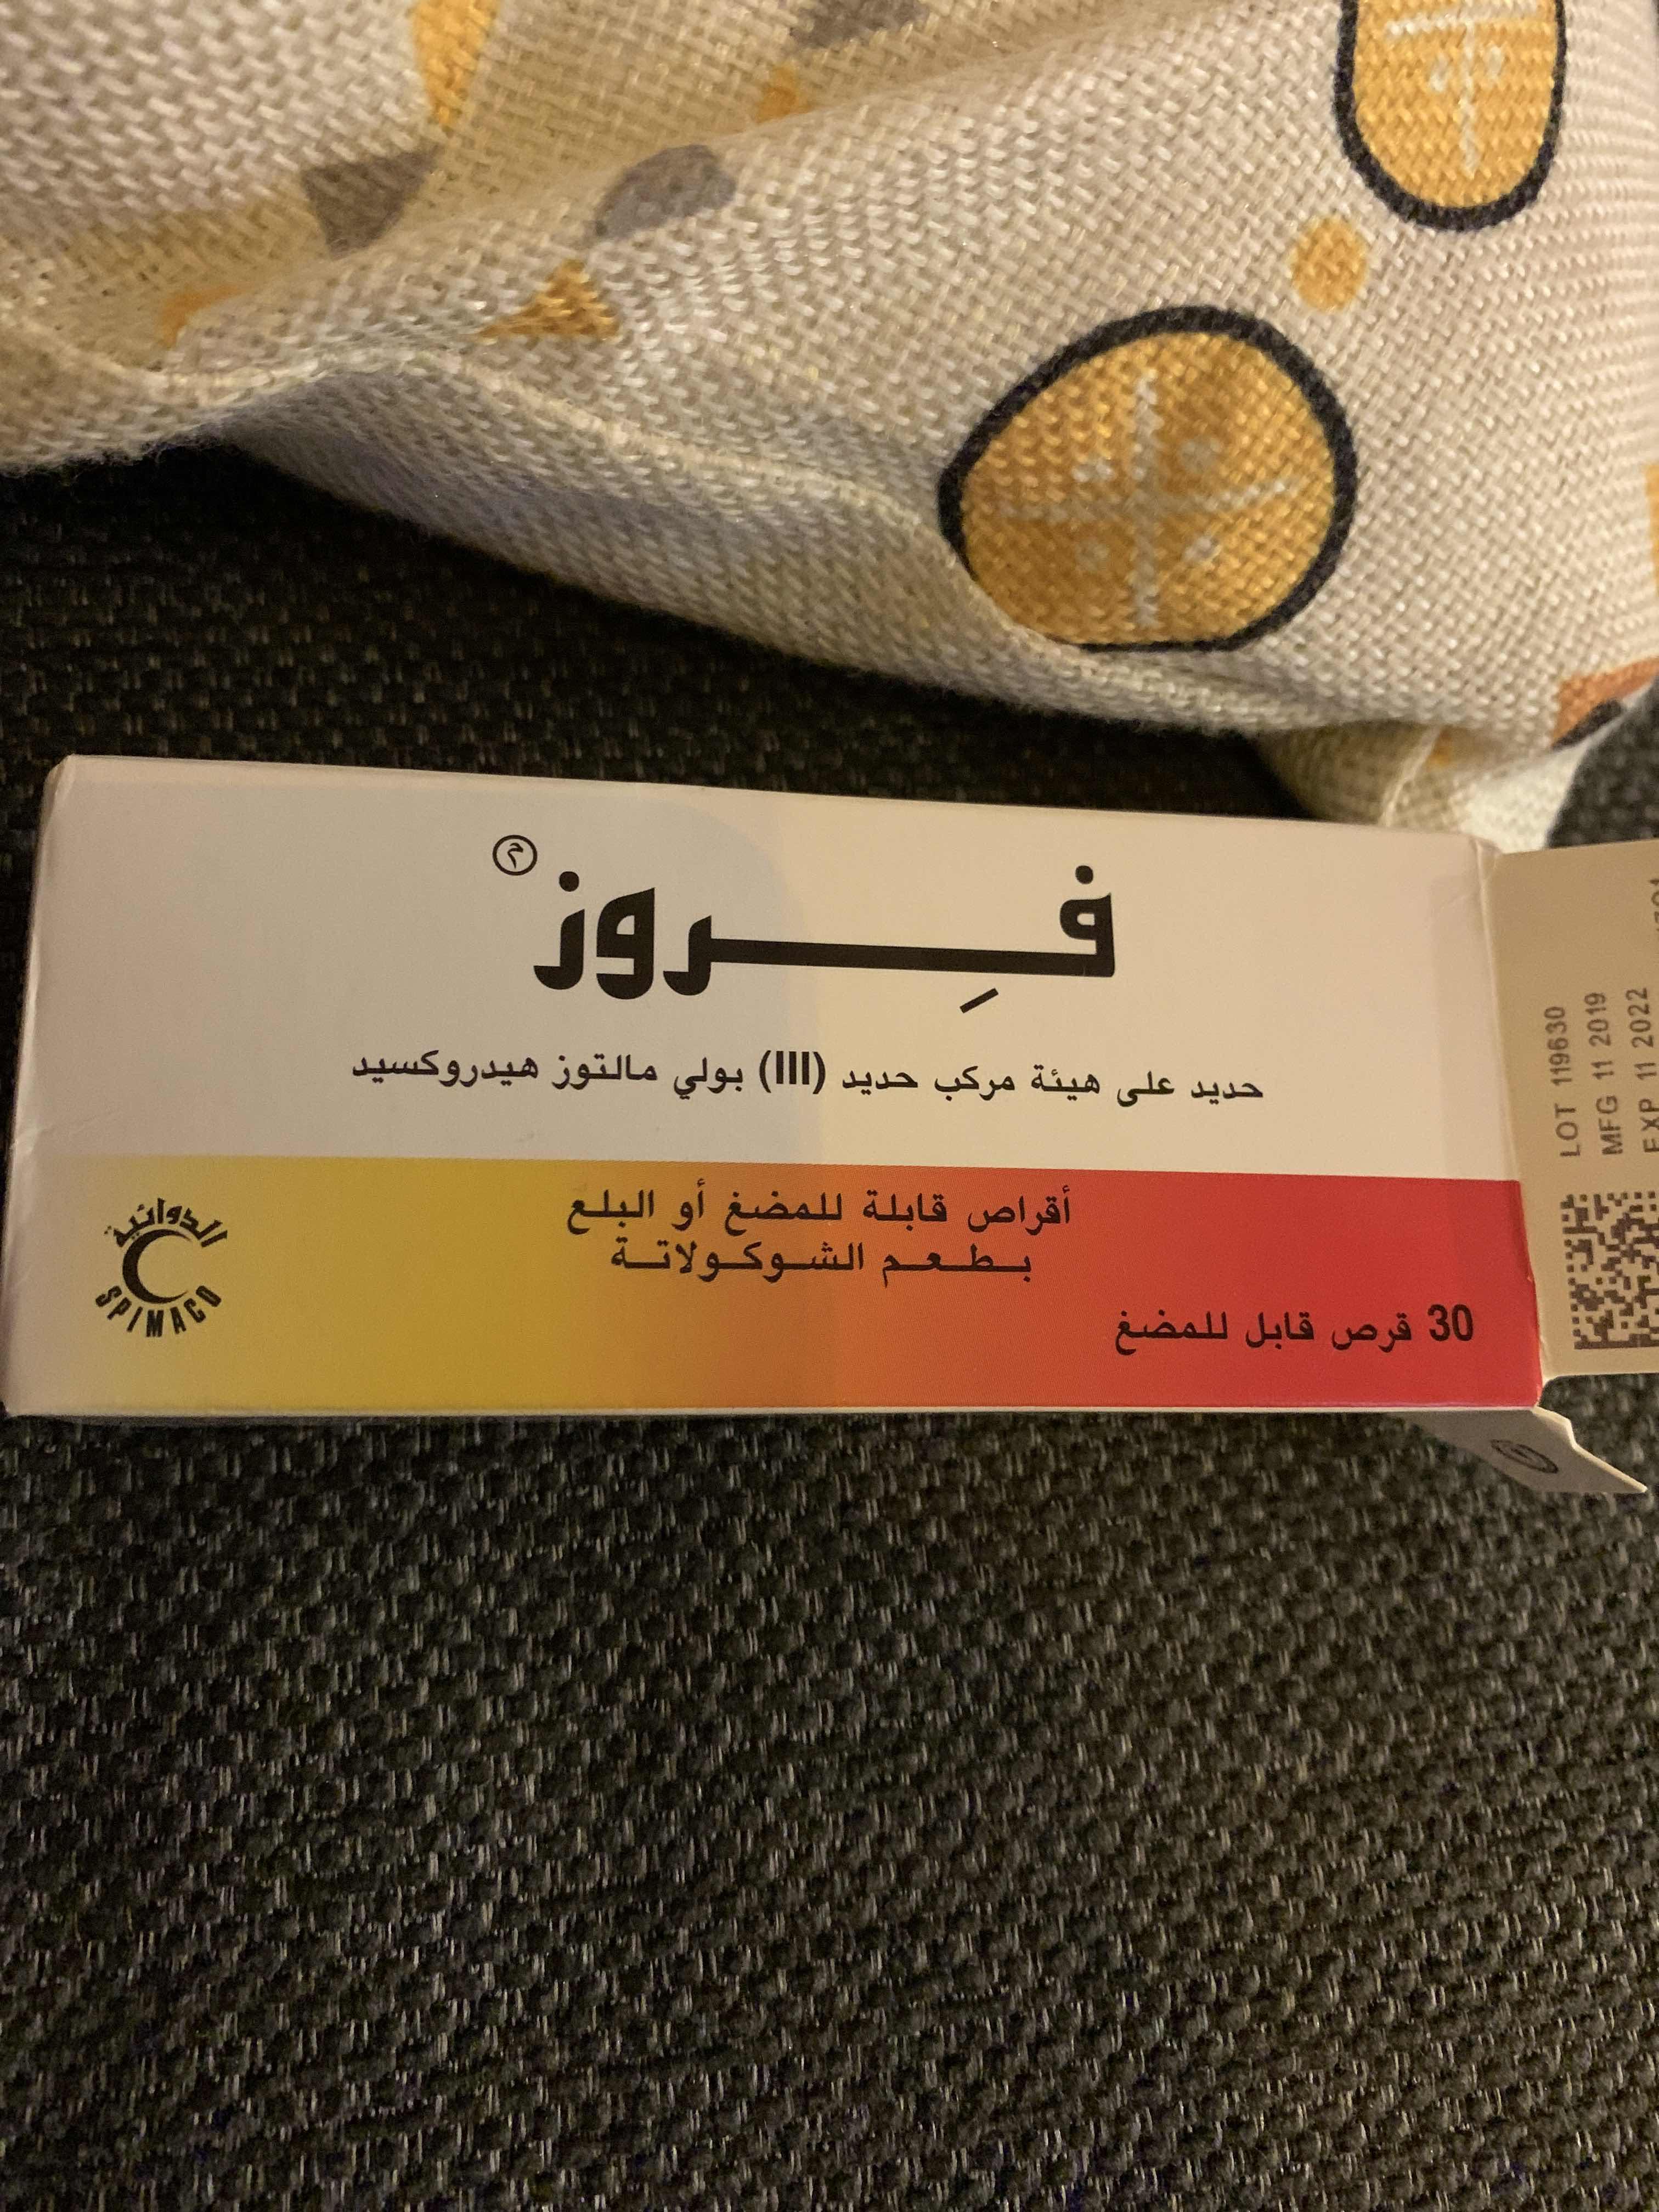 استشاره بشان حبوب فروز هل اخذهم ام لا الطبي